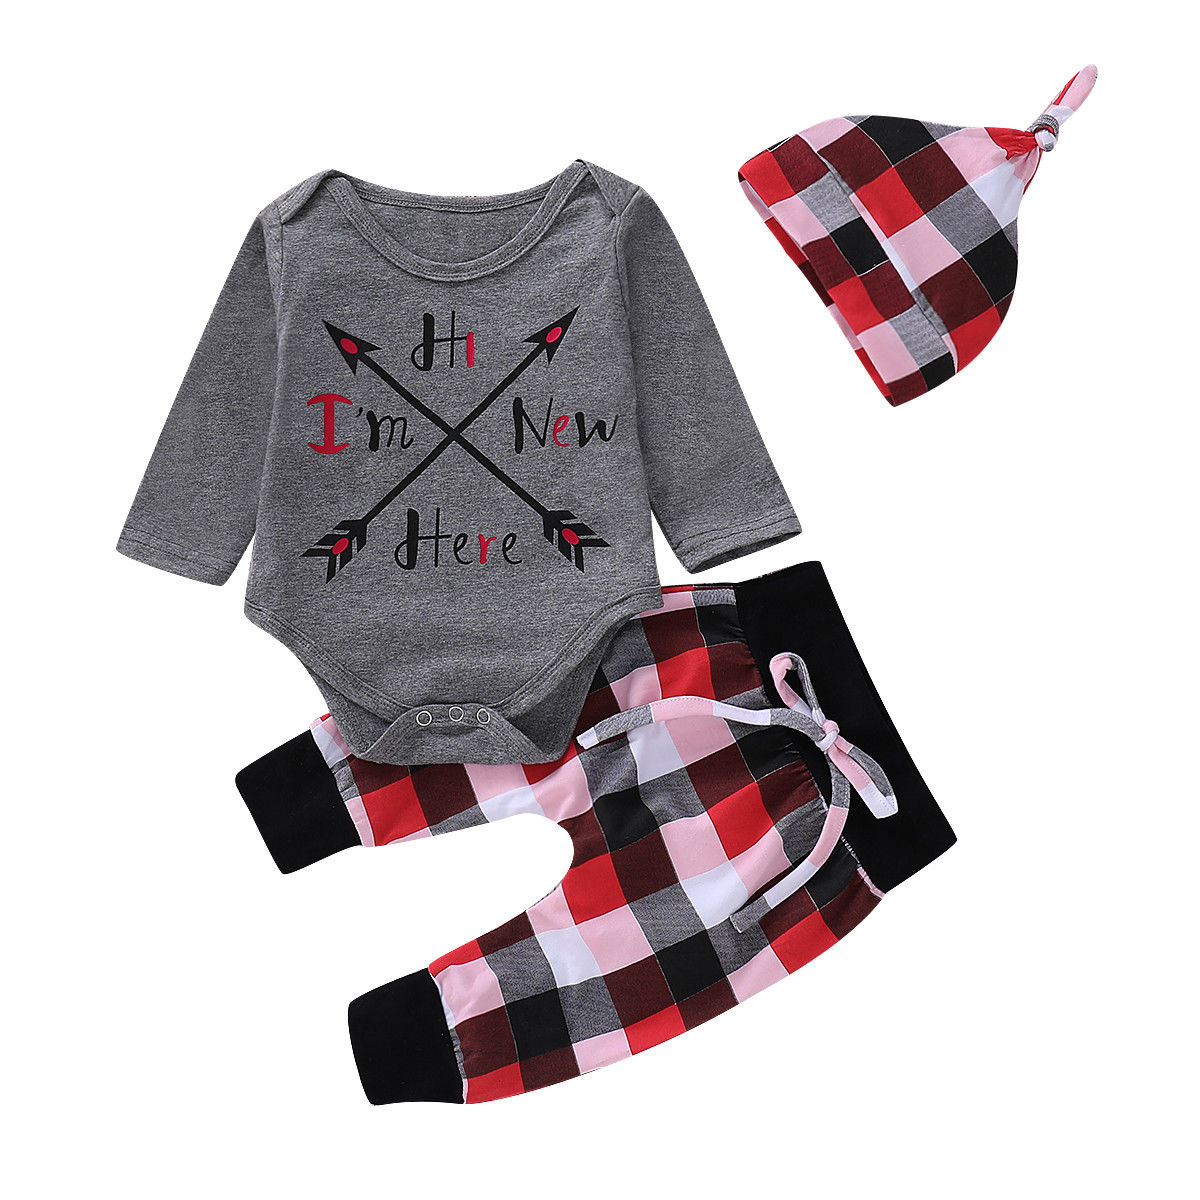 0-18M Autumn Winter Casual Infant Kids Baby Girls Boys Sets Arrow Print Grey Romper Tops+Plaid Pants+Hats